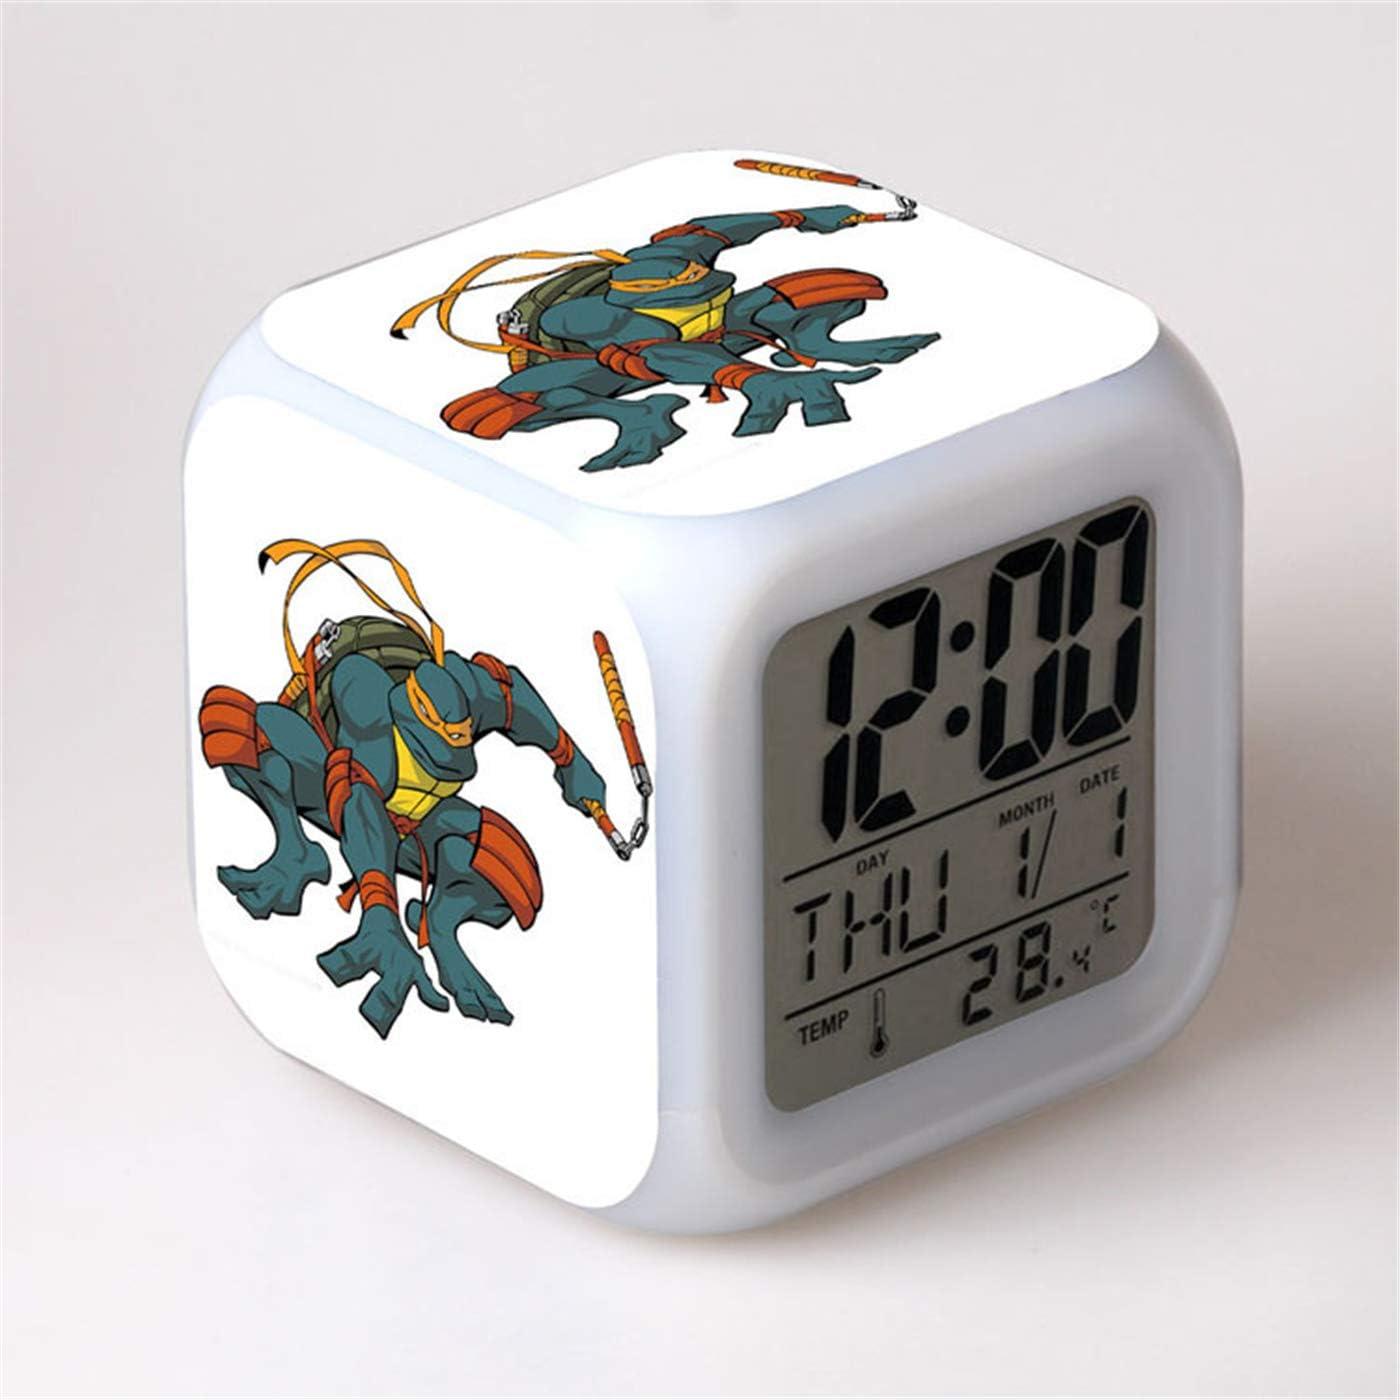 Coo-kid Teenage Mutant Ninja Turtles Clock-7 Color Change LED Digital Alarm Clock Kids Small Alarm Clock Night Glowing Clock